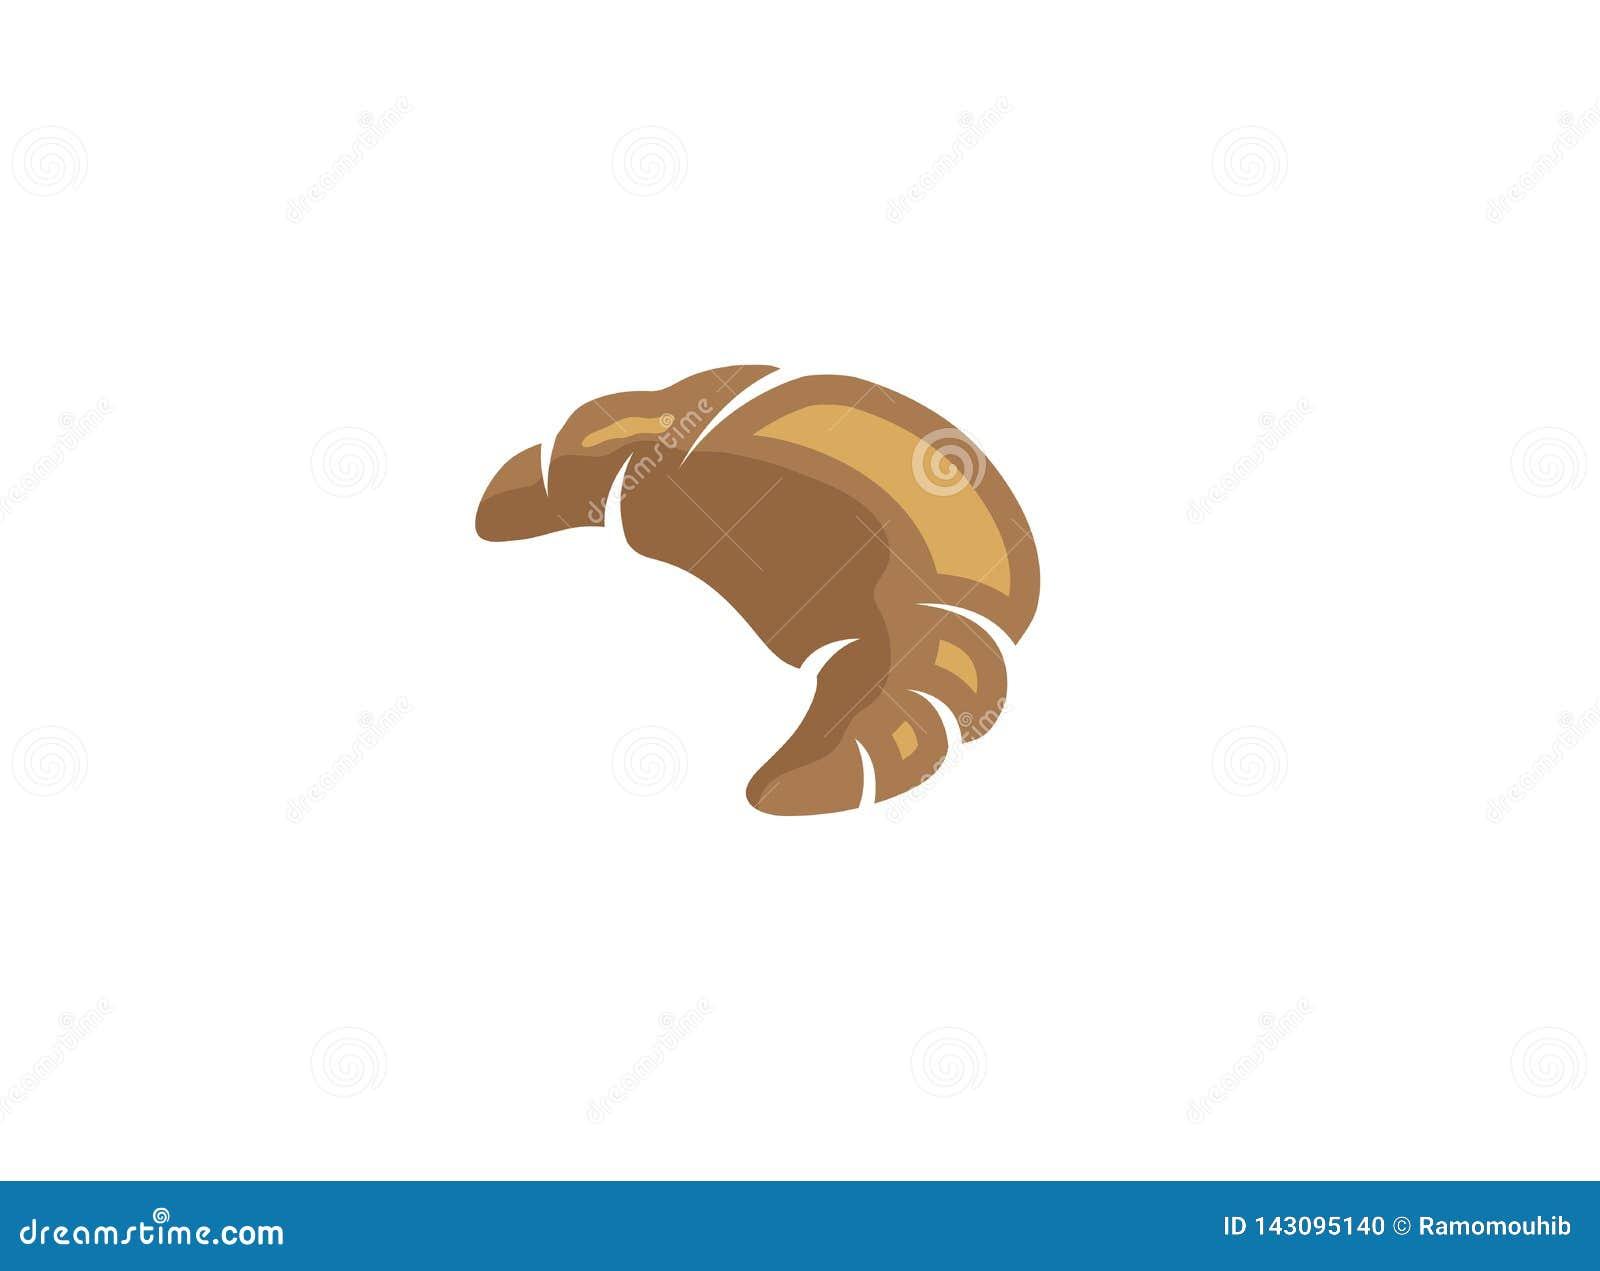 Crescent a croissant hand for logo design